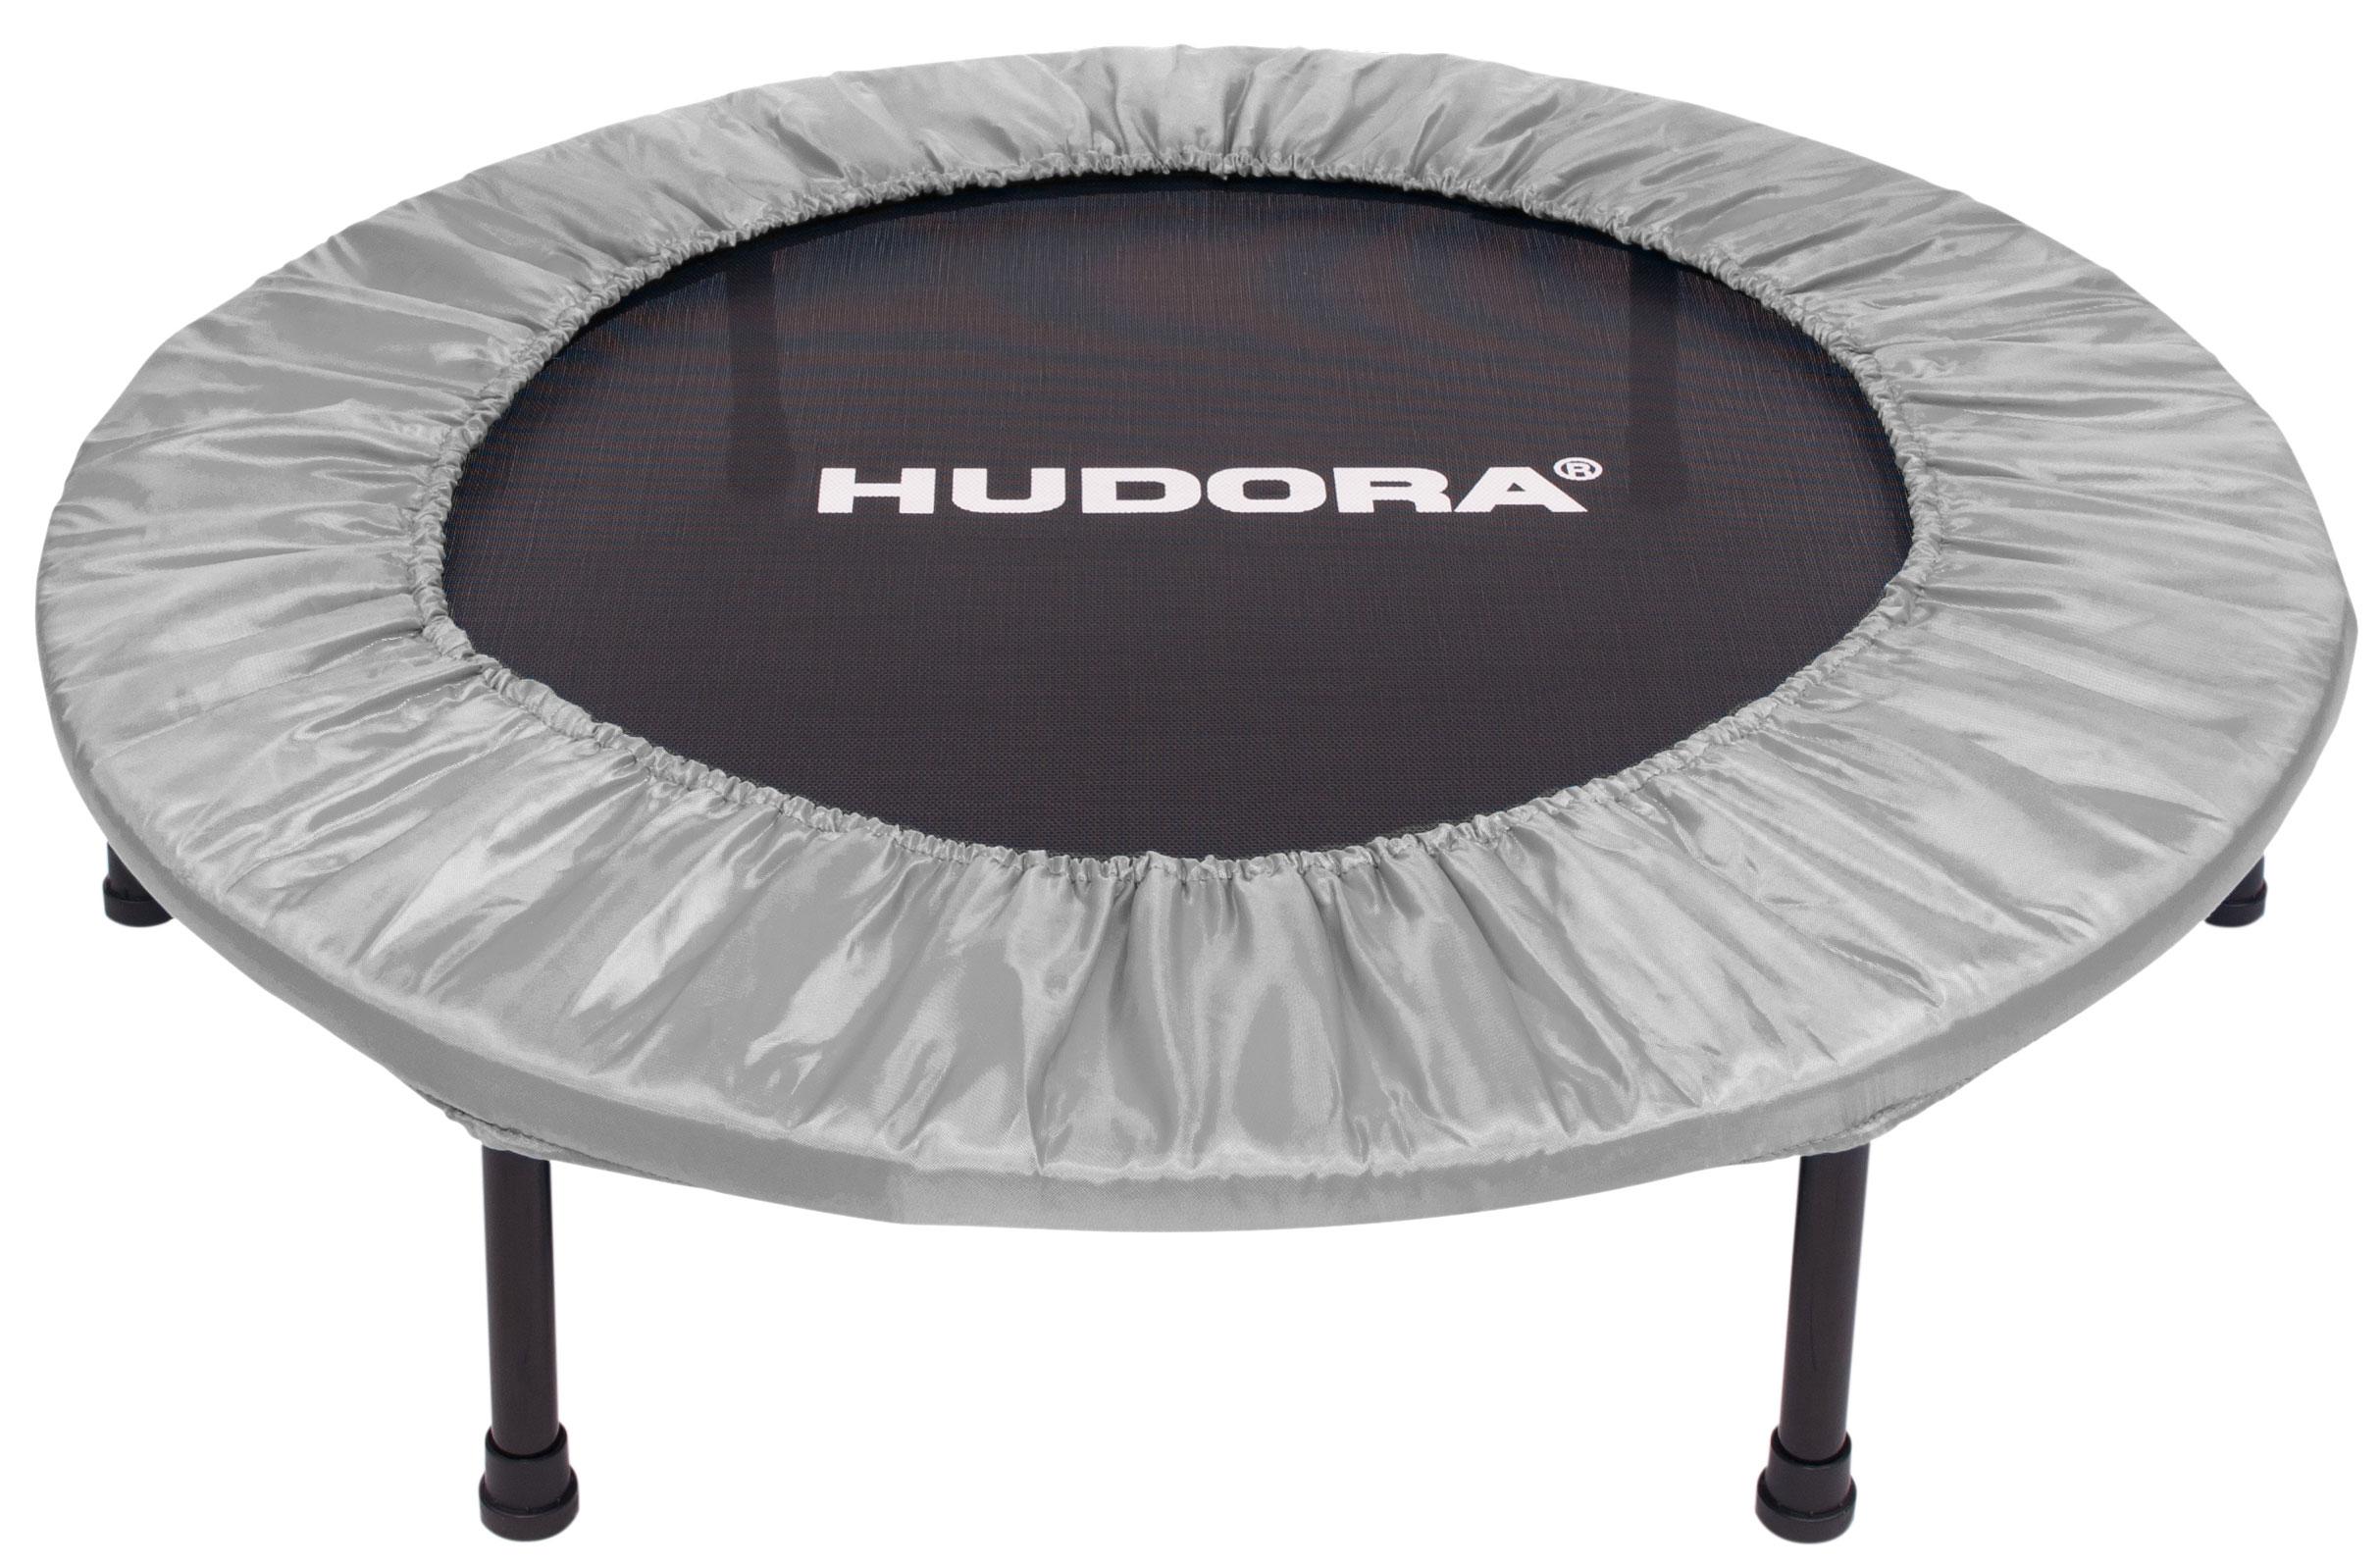 hudora trampolin faltbar 96cm grau bei. Black Bedroom Furniture Sets. Home Design Ideas